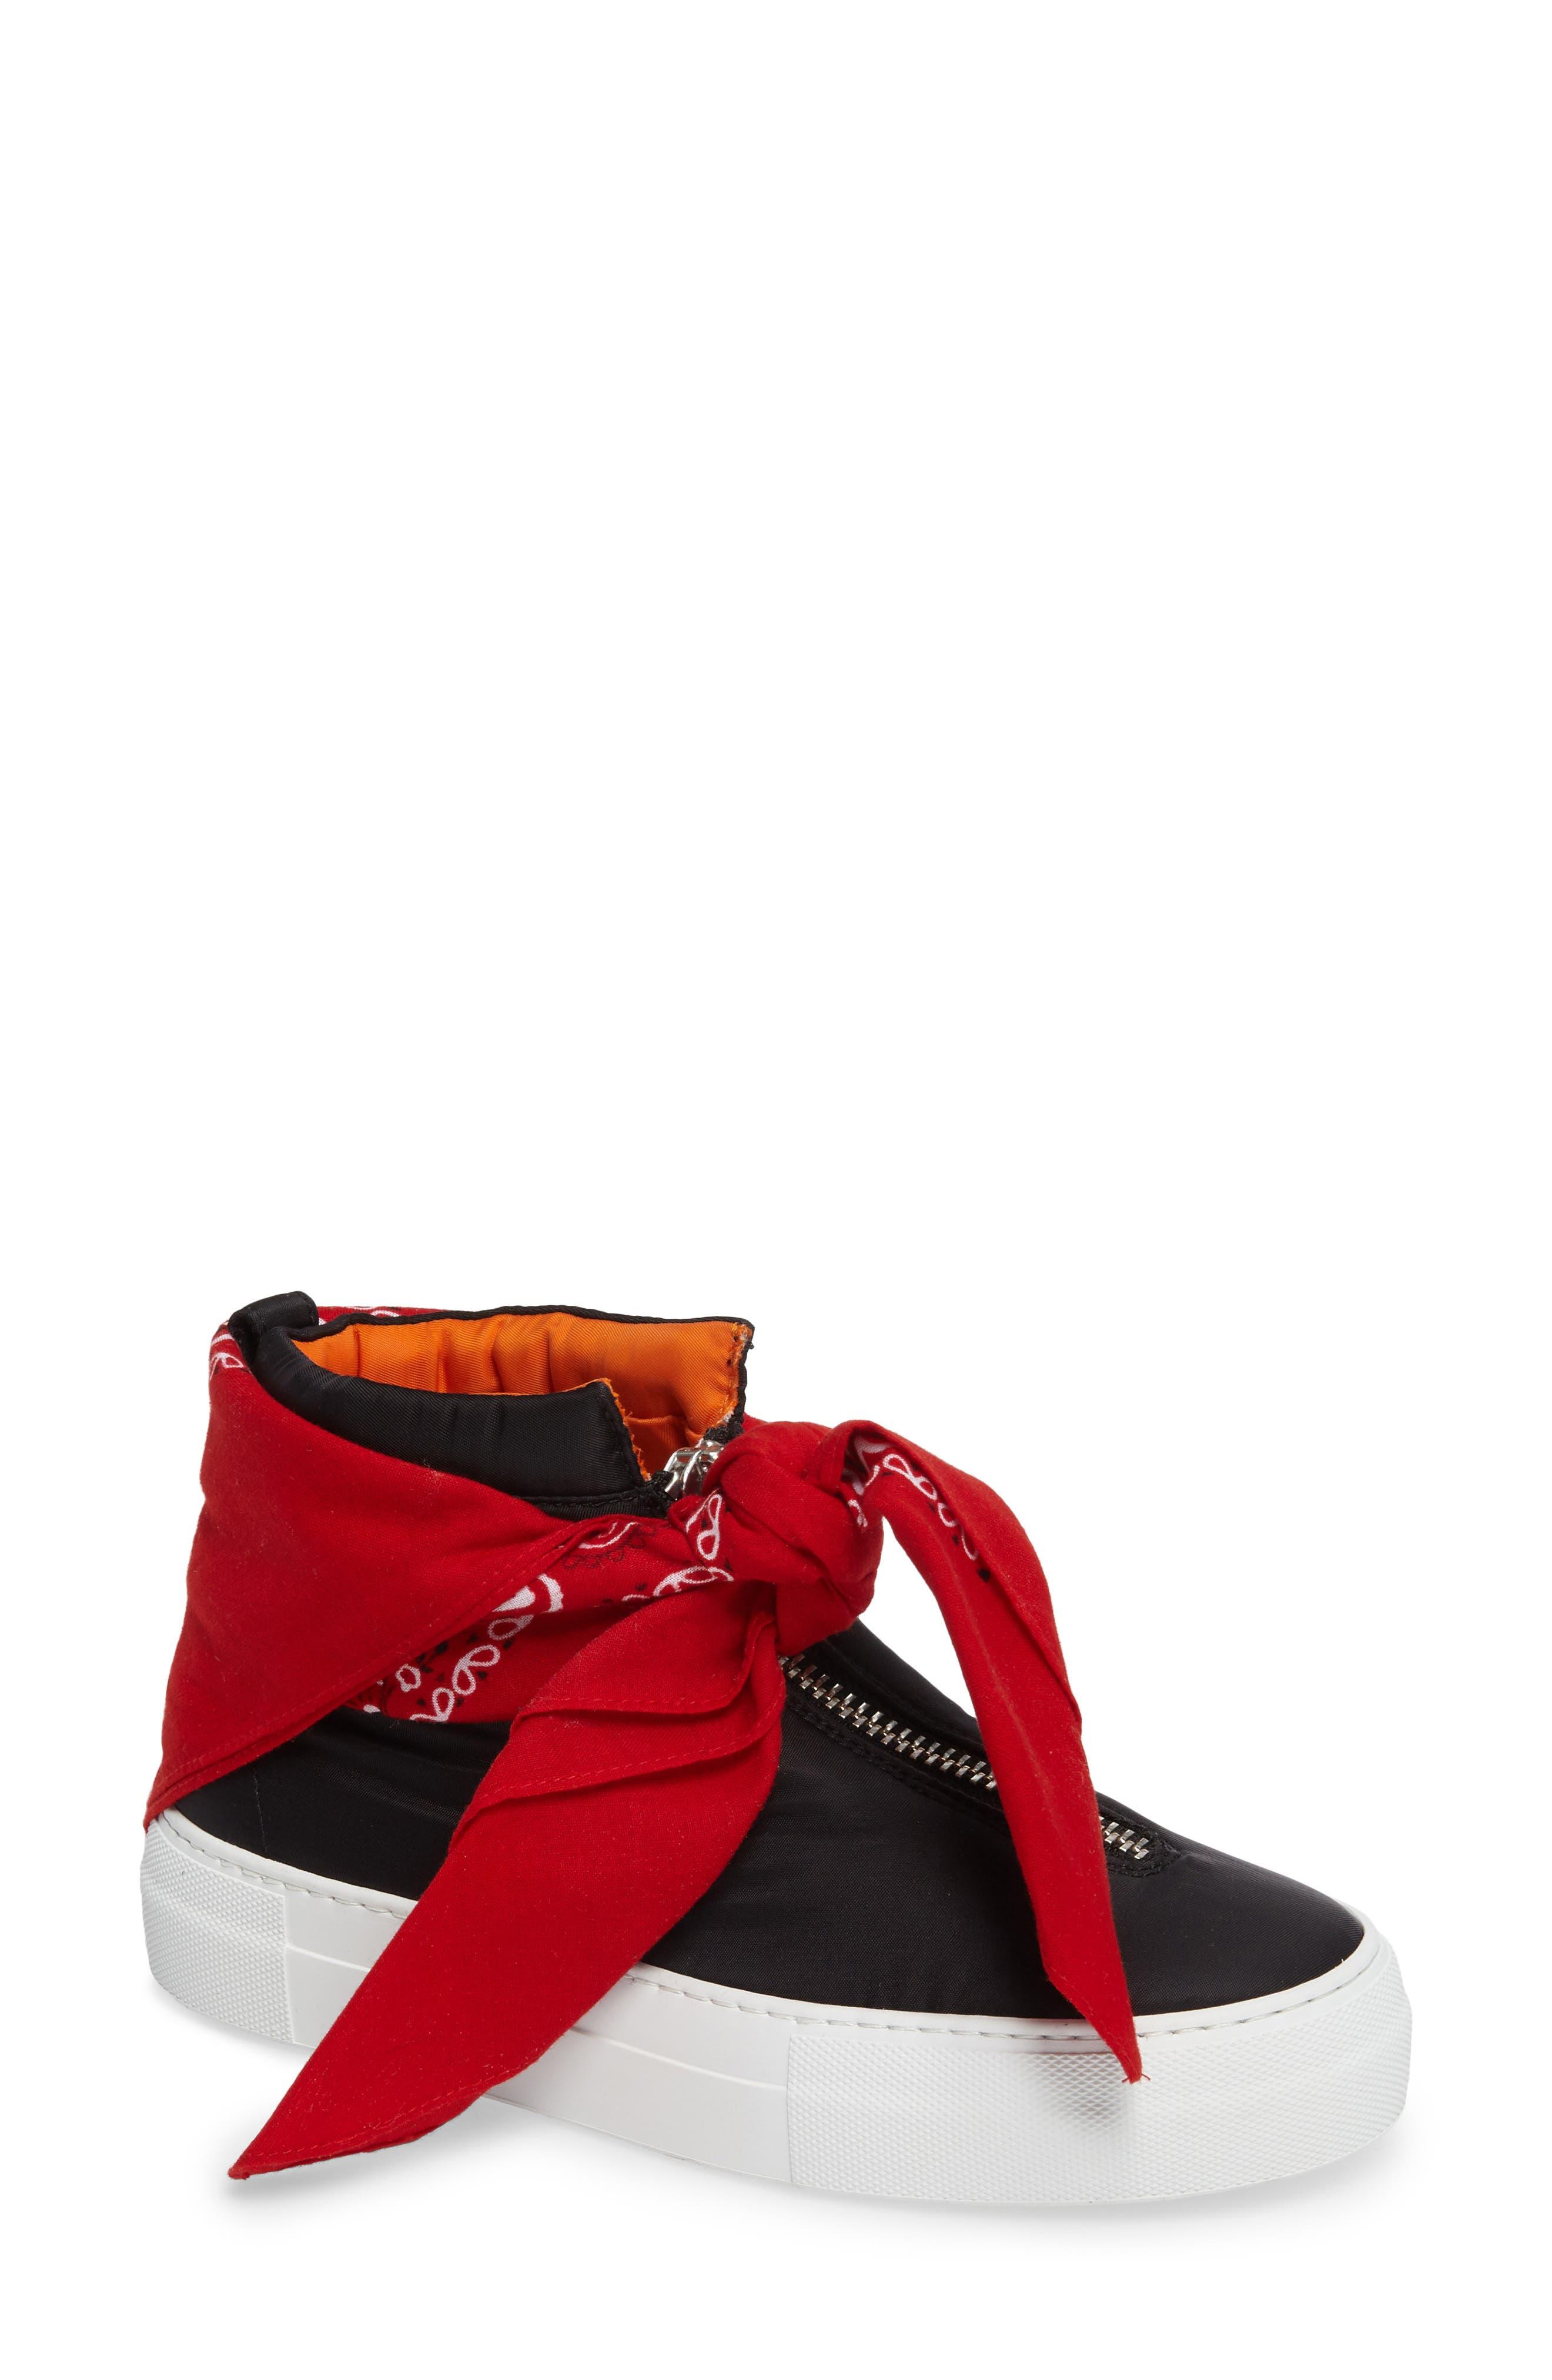 Main Image - Joshua Sanders Bandana High Top Sneaker (Women)